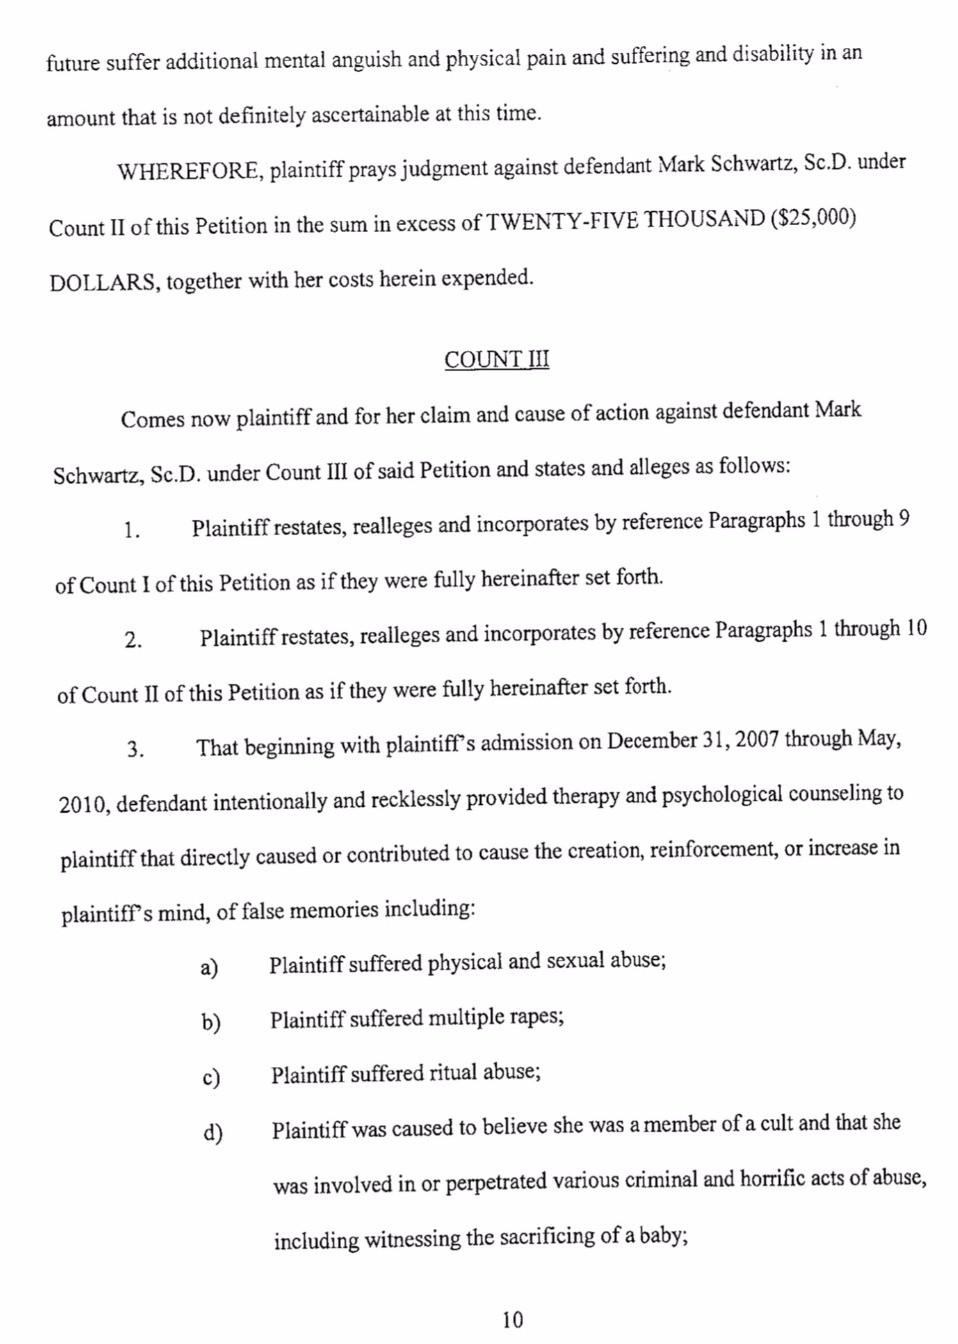 Castlewood Lawsuit/Mark Schwartz #2 - Leslie Thompson - page 10